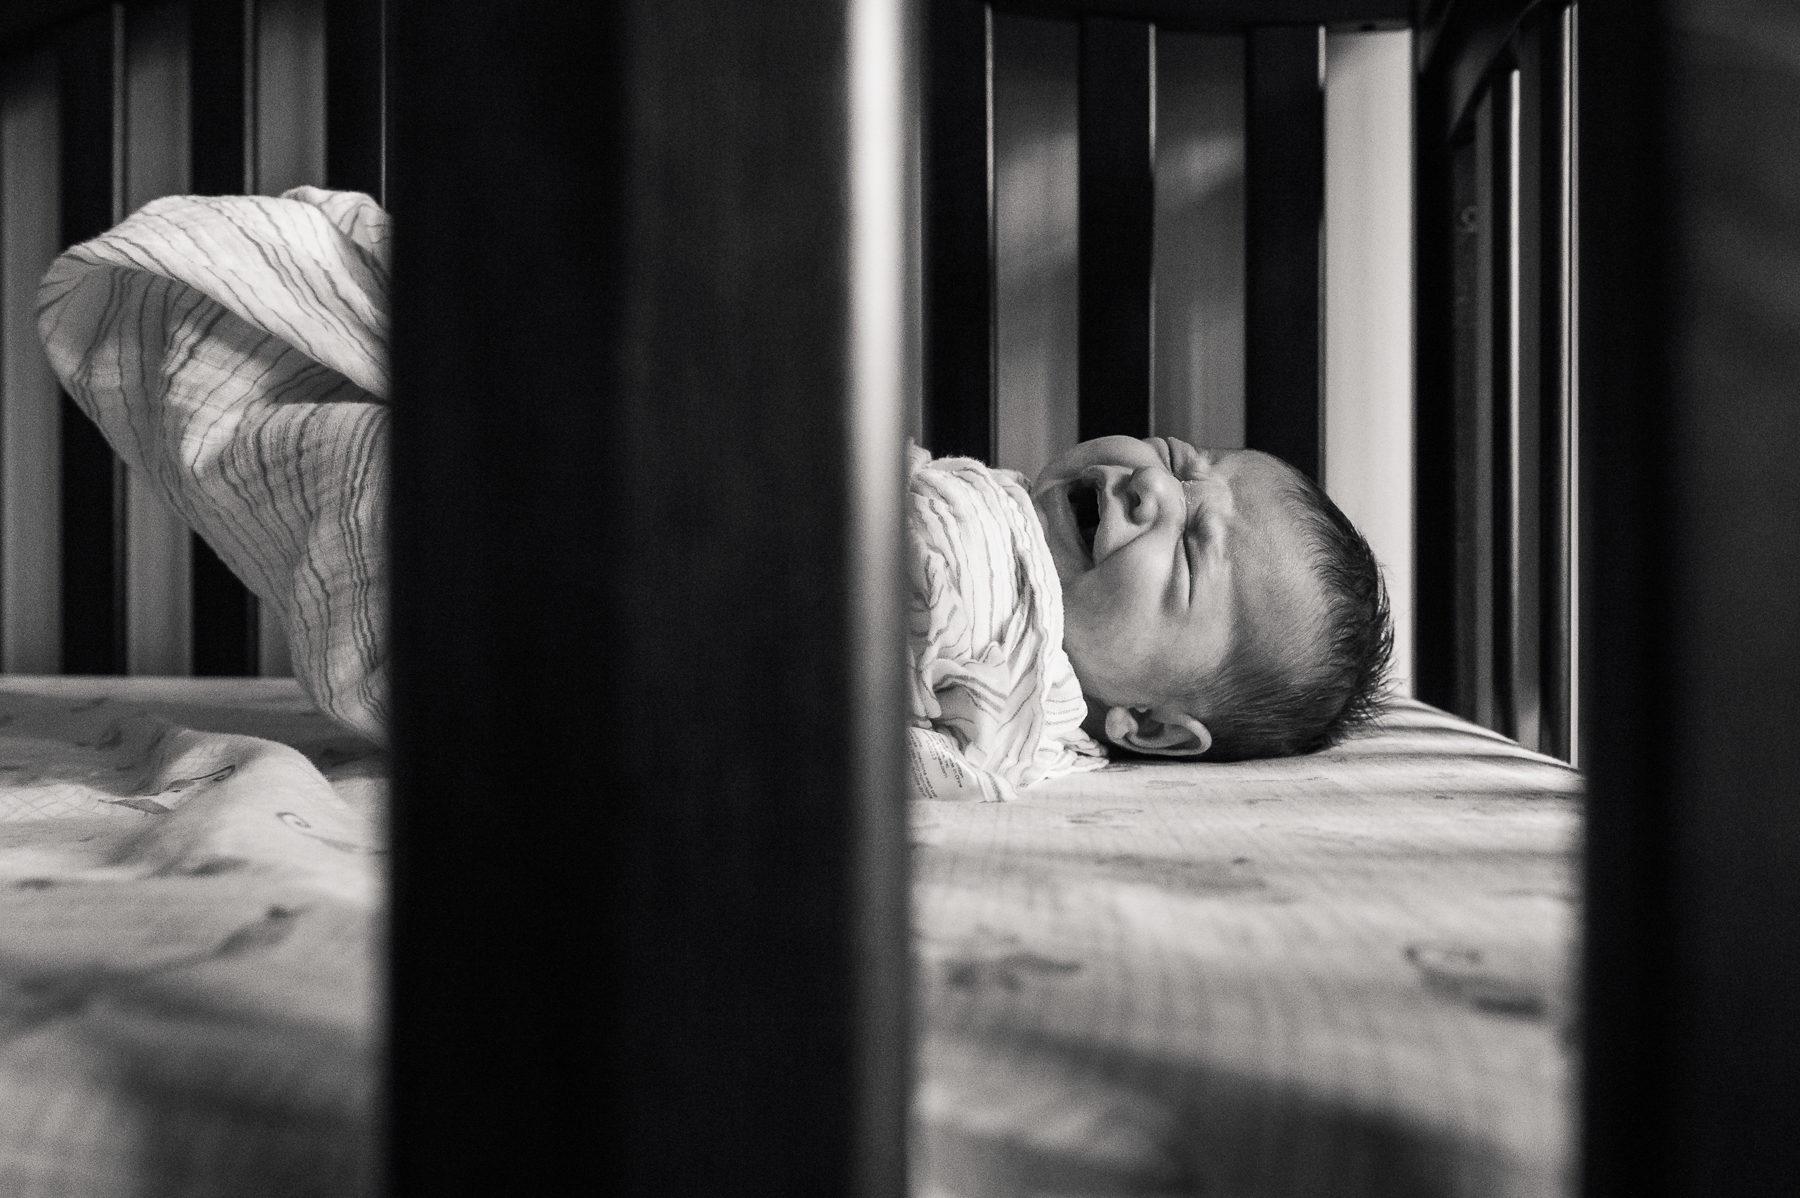 Newborn baby girl crying in crib